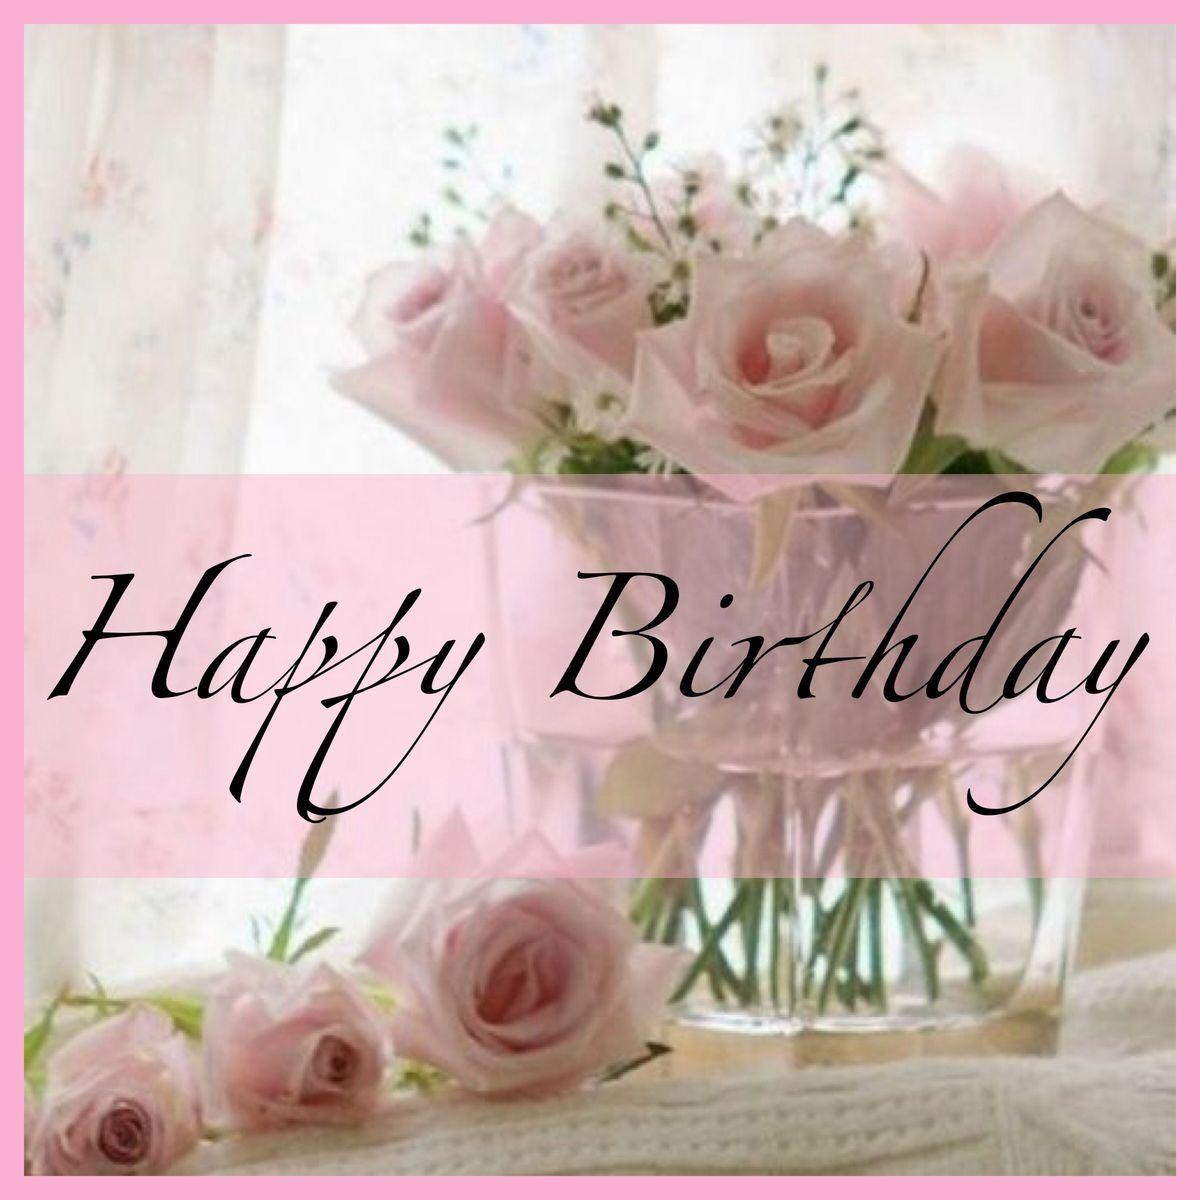 Szlinapi quotes pinterest birthday happy birthday and szlinapi happy birthday pictures happy birthday wishes flowers pink happy birthday happy birthday izmirmasajfo